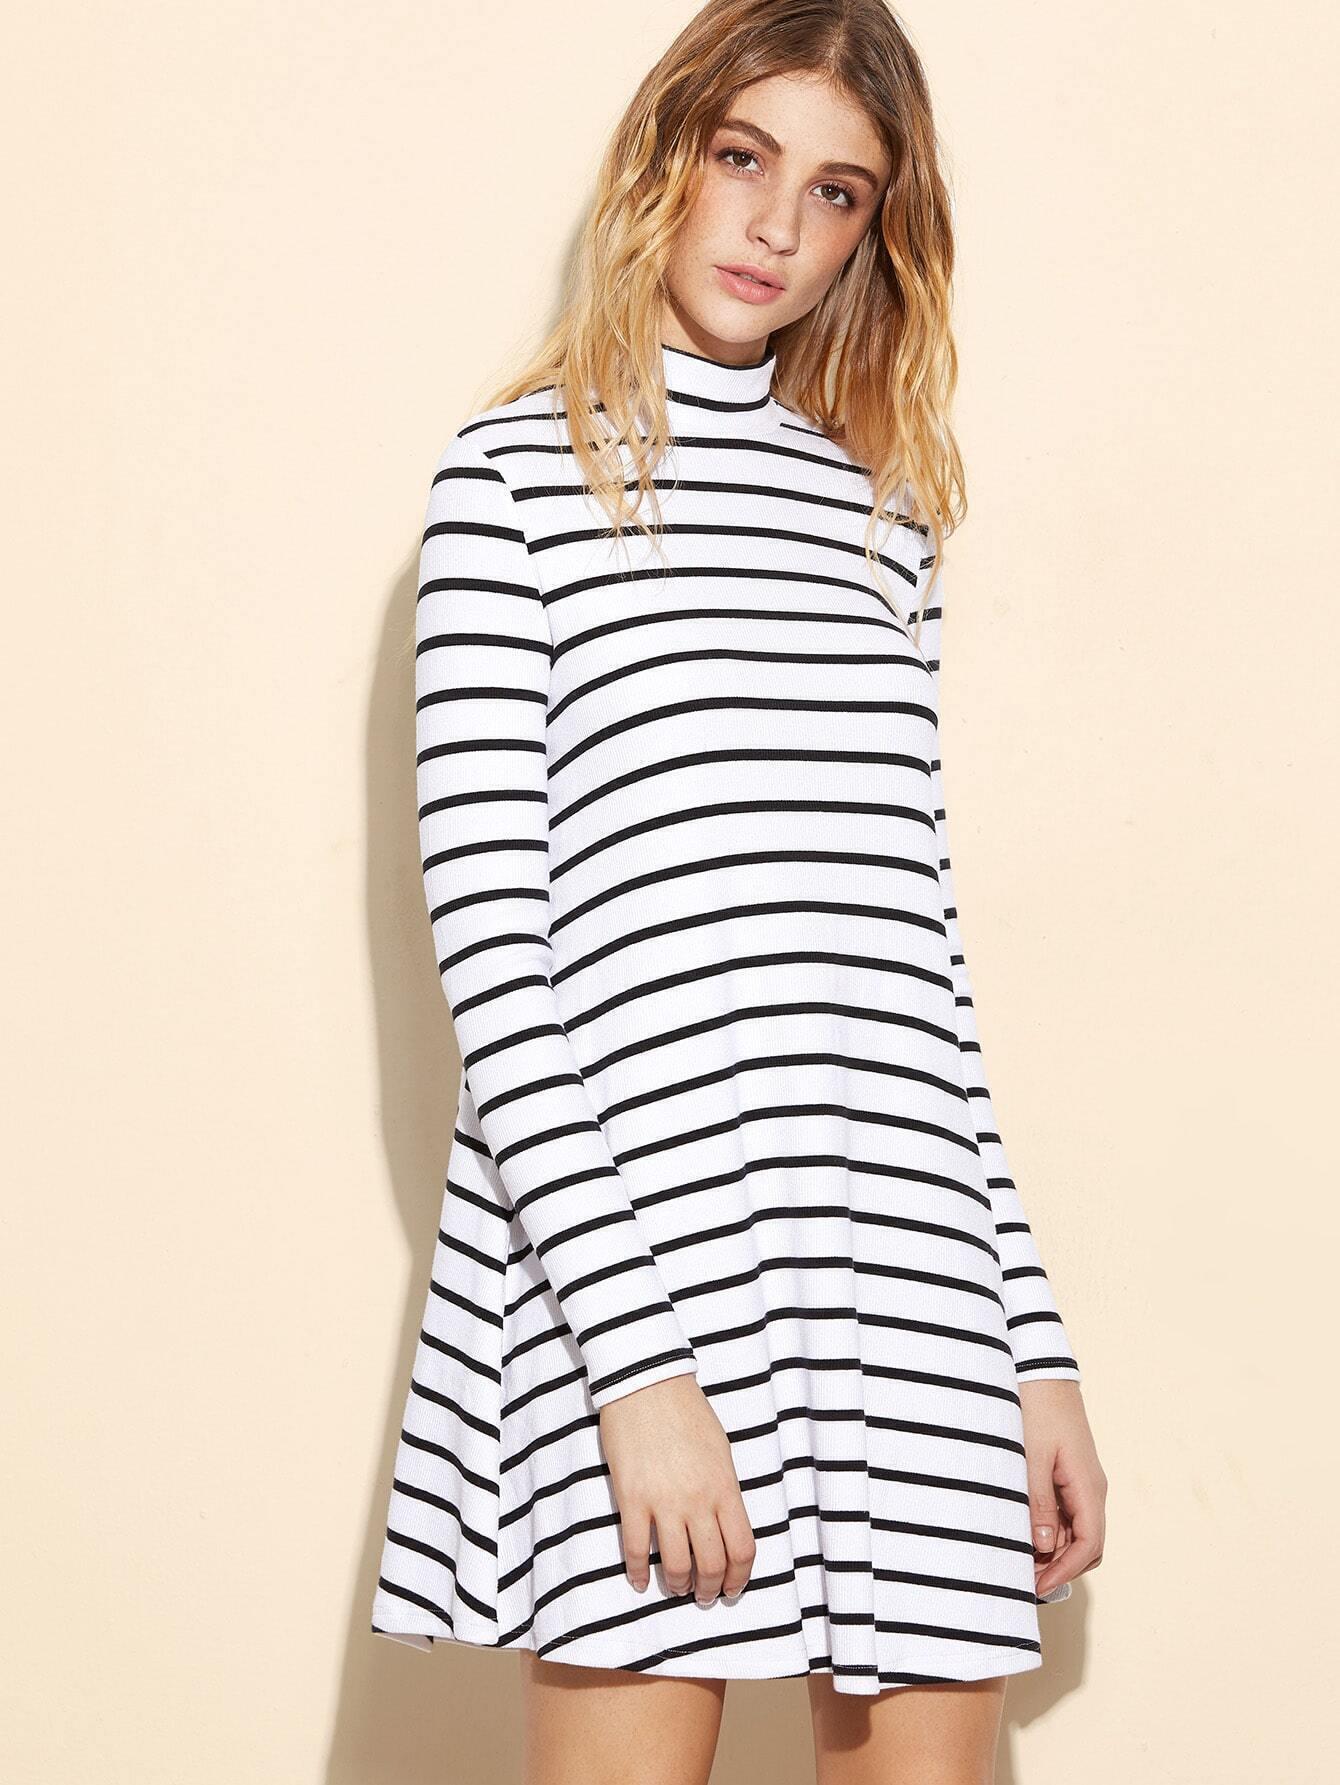 e6ab18b0f9 White Striped Ribbed Knit Swing Dress EmmaCloth-Women Fast ...